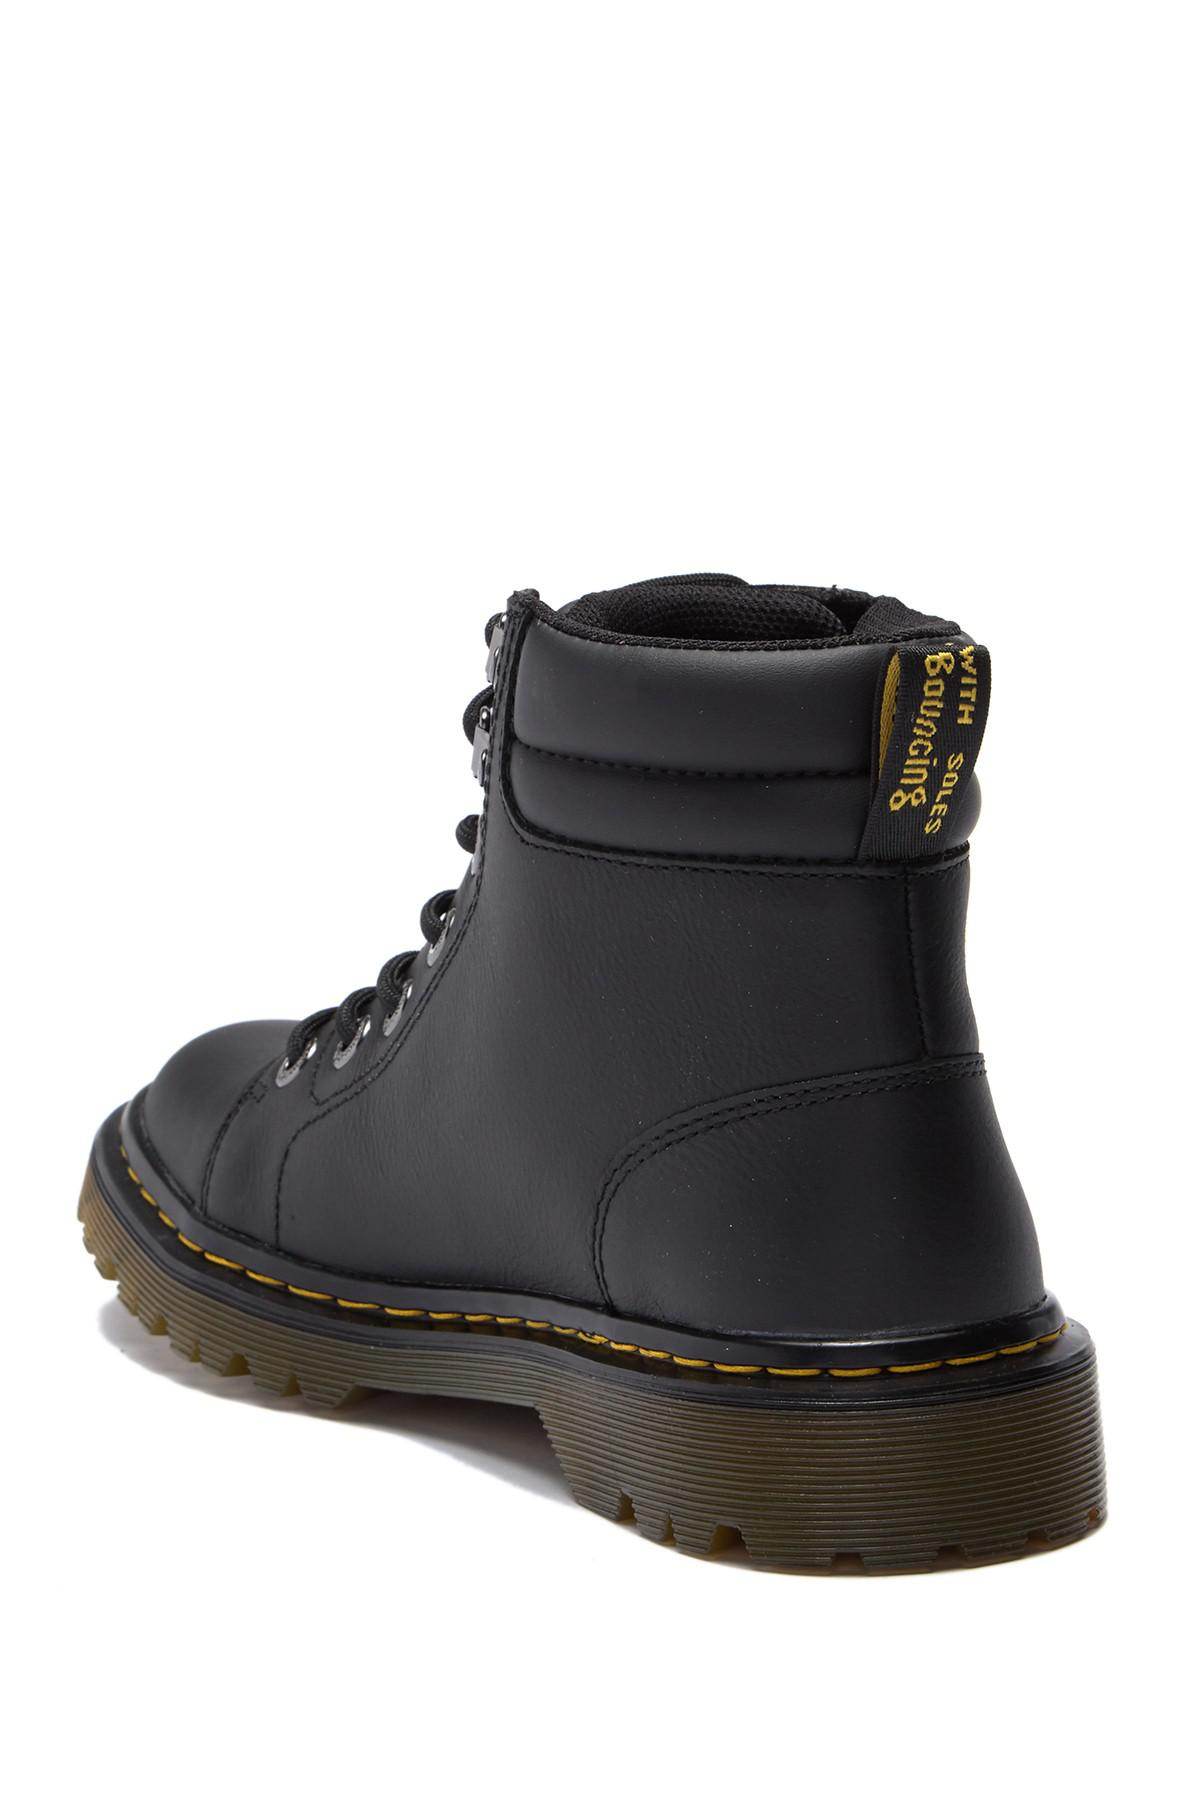 5ba985621200 Dr. Martens - Black Faora Mid Top Leather Boot - Lyst. View fullscreen